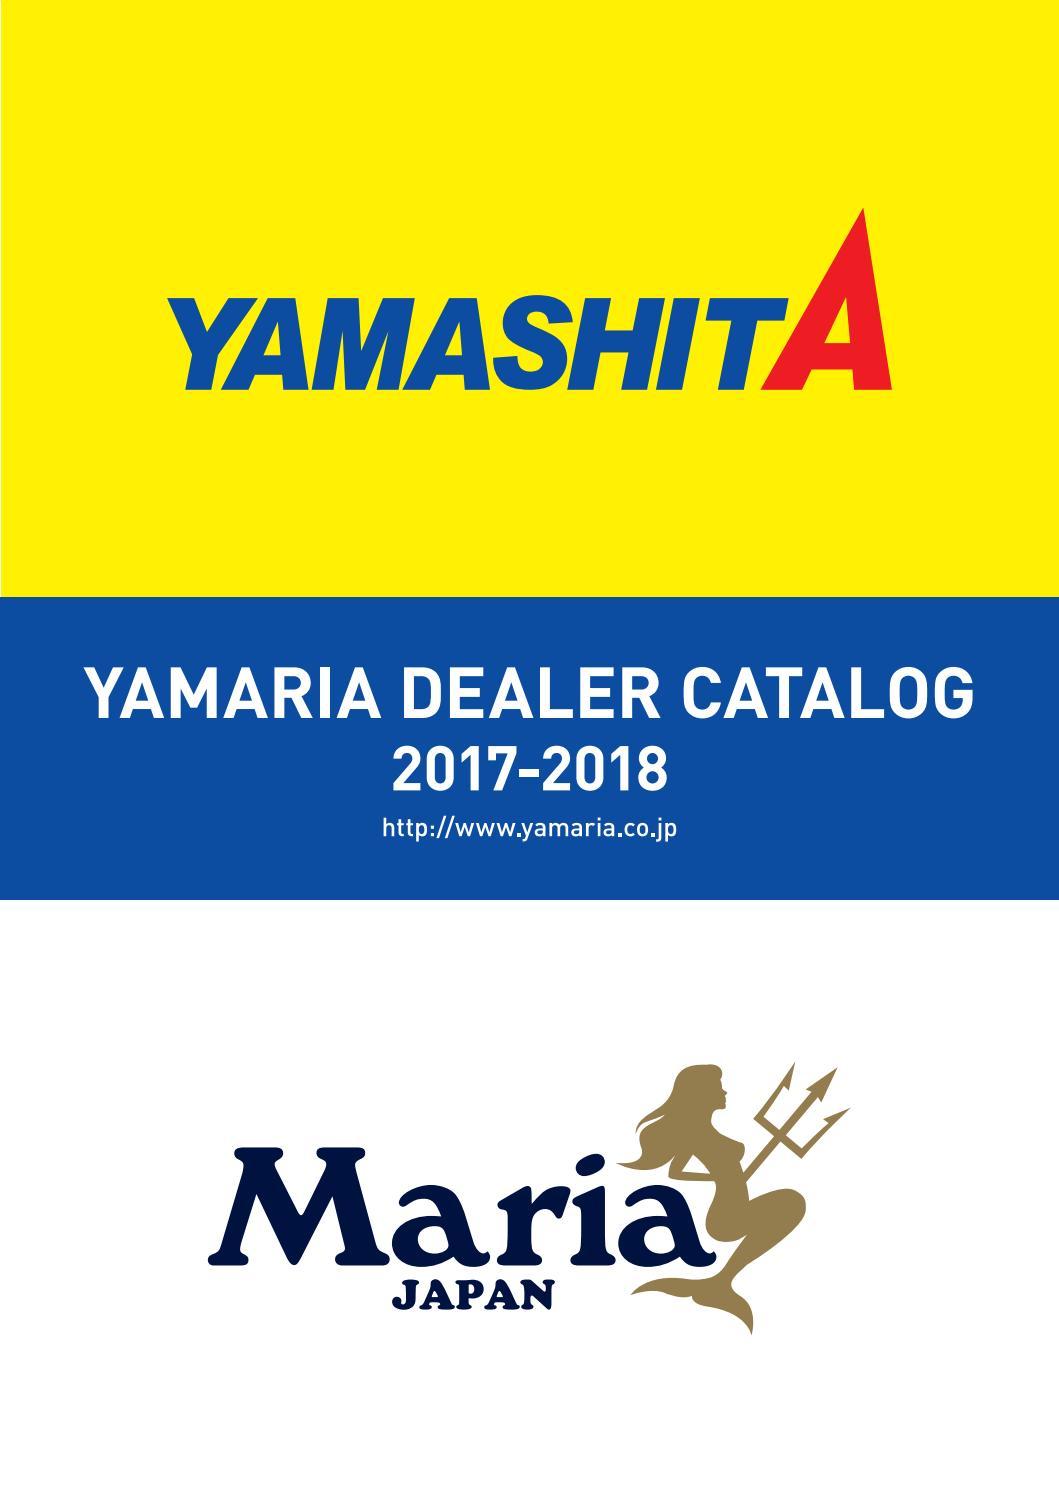 Yamashita EGI OH Q LIVE SEARCH #2.5 Basic N03//NMIH Warm Jacket Rattle Squid Jig